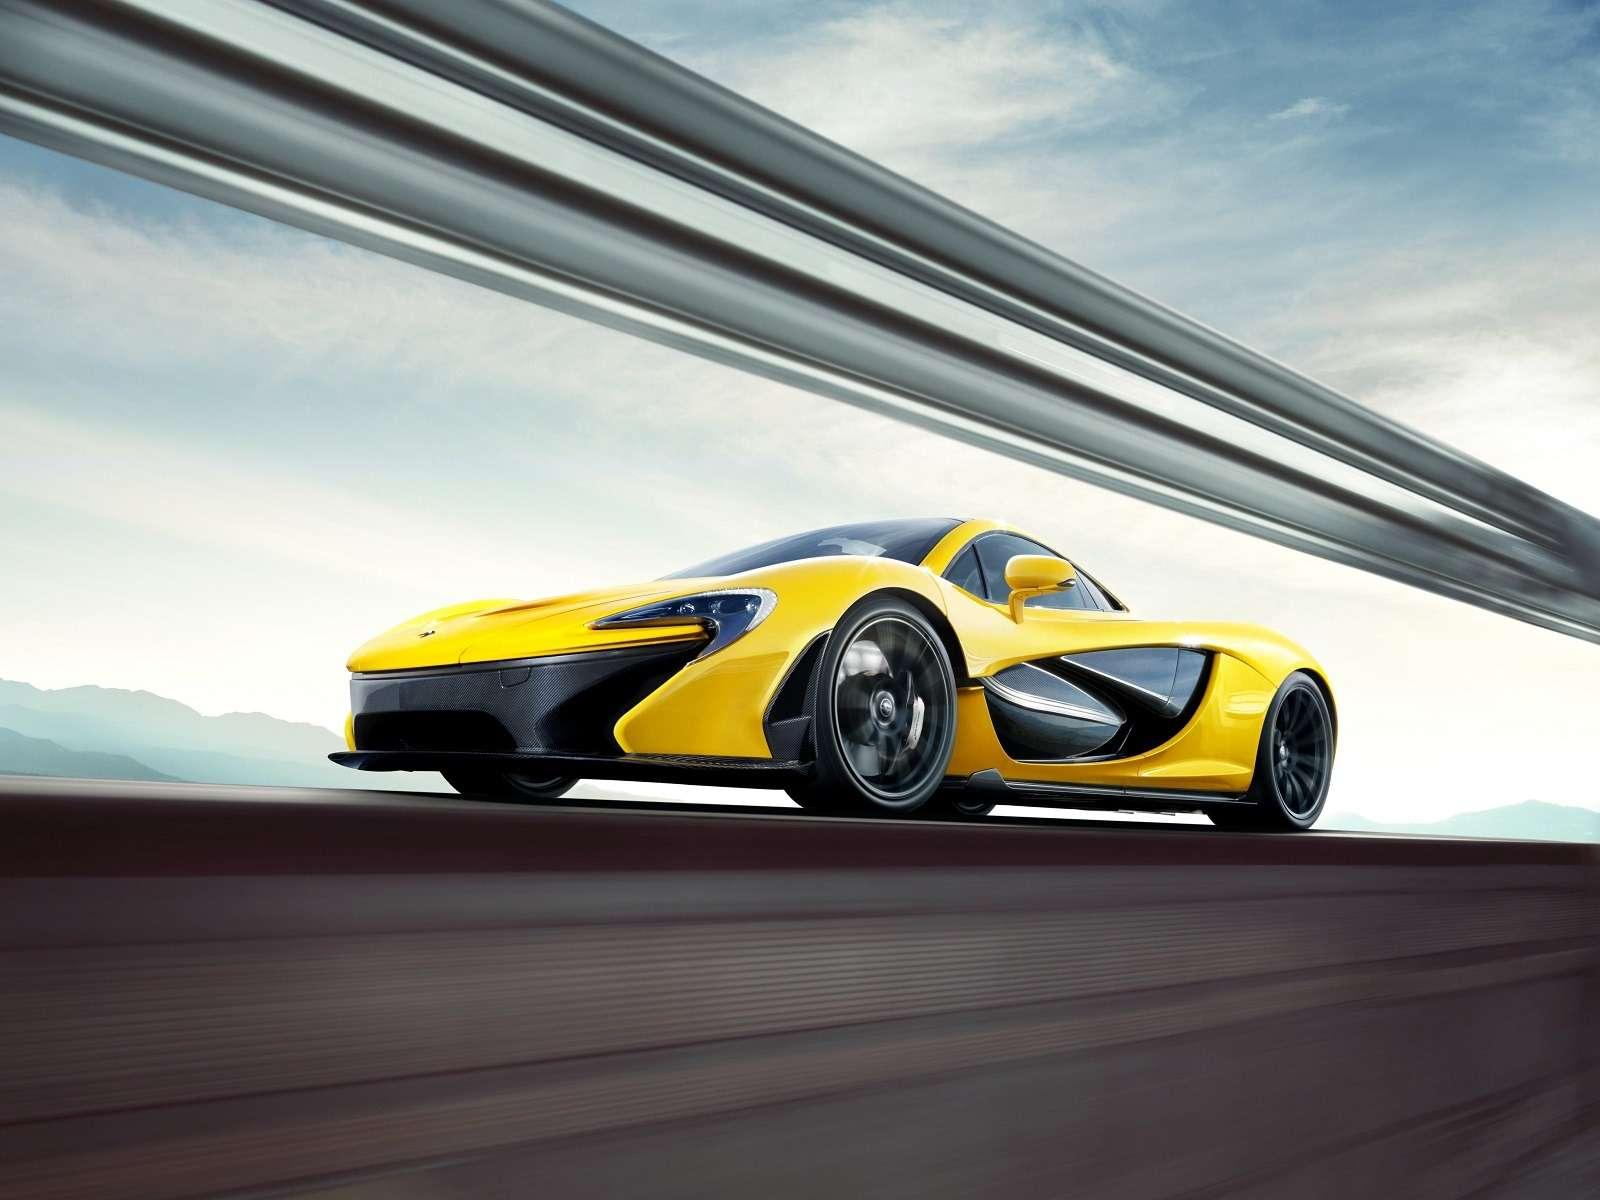 Владелец суперкара McLaren вСША попал вДТП сразу после покупки— фото 362620